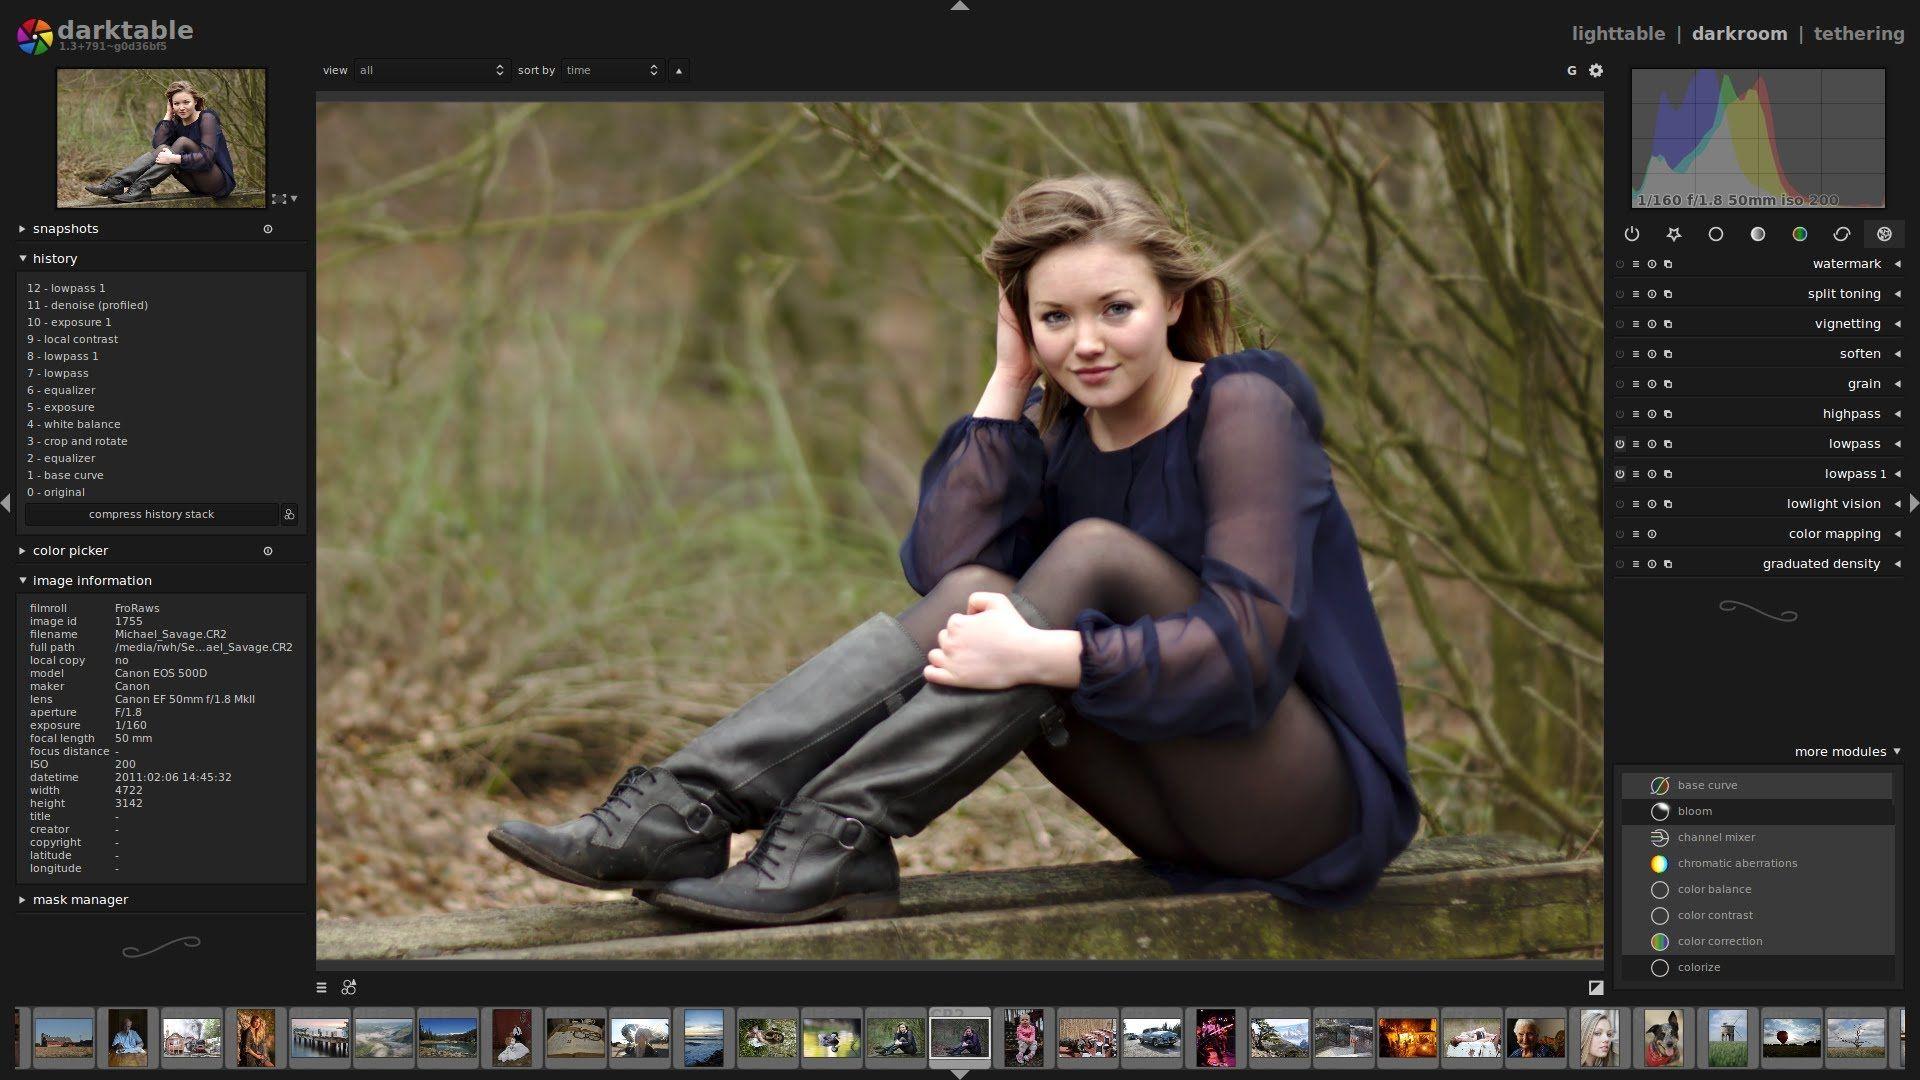 Darktable RAW edit: Lady in boots | Darktable | Photography